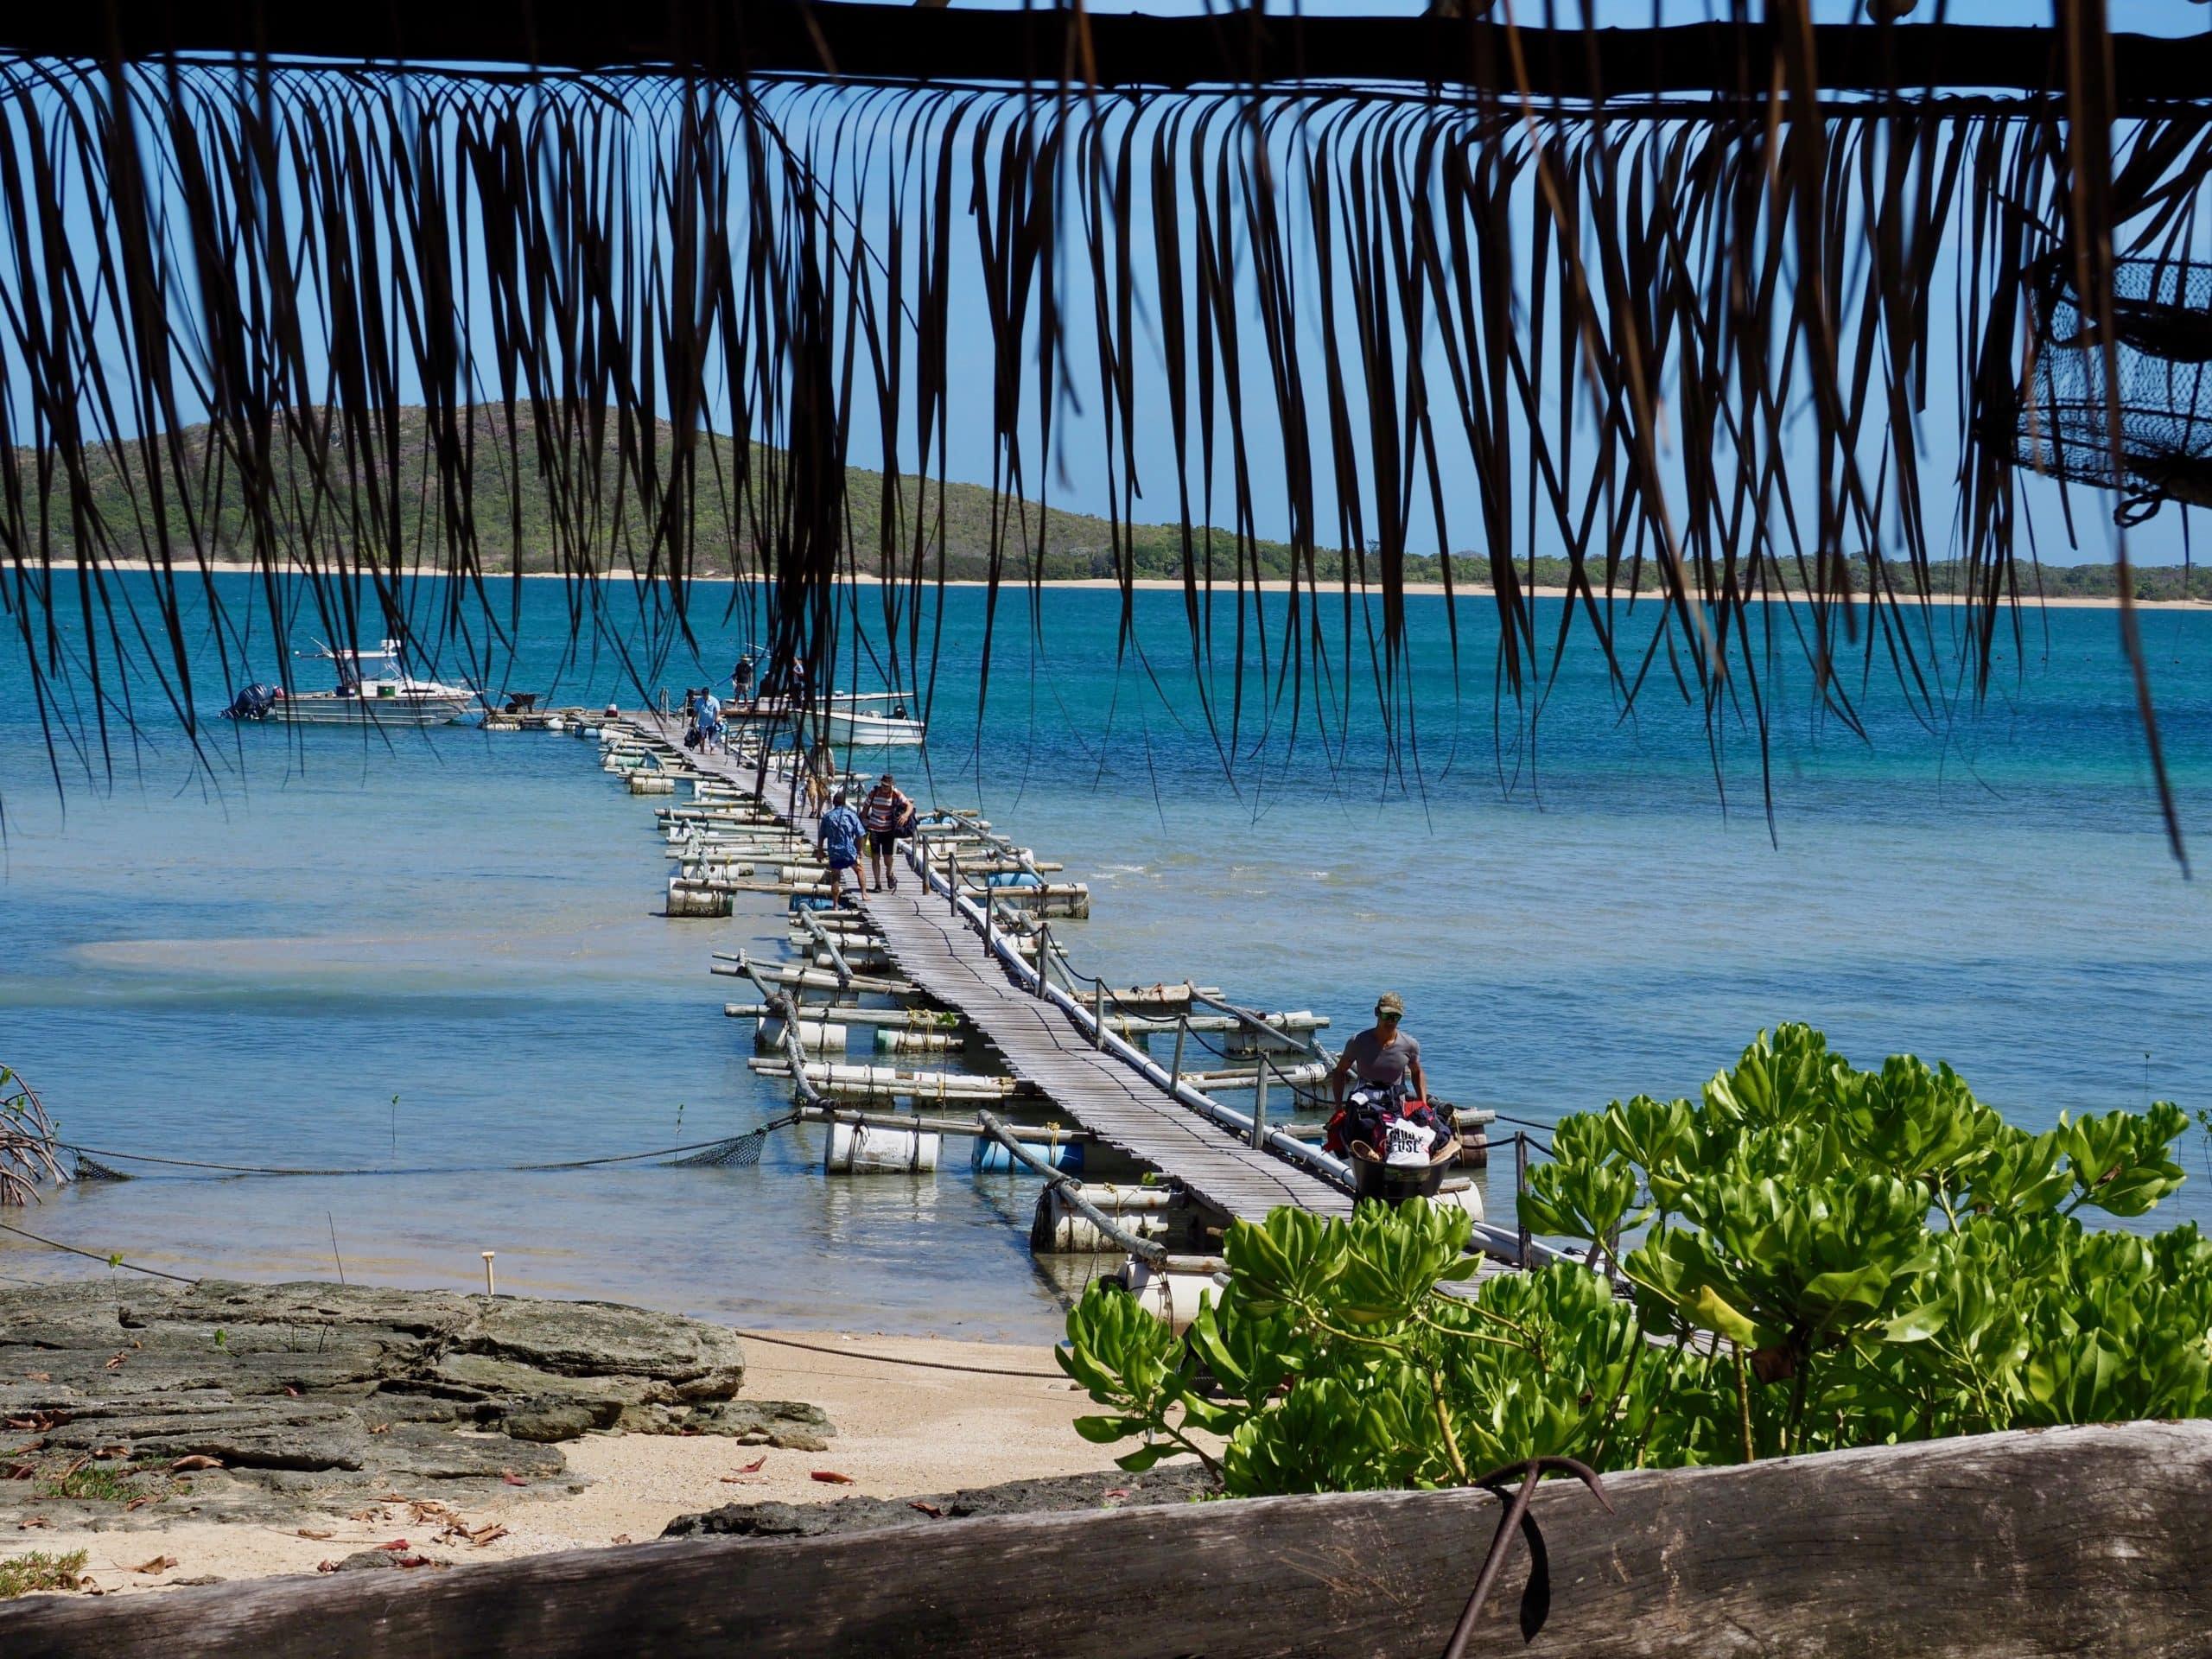 Roko Island